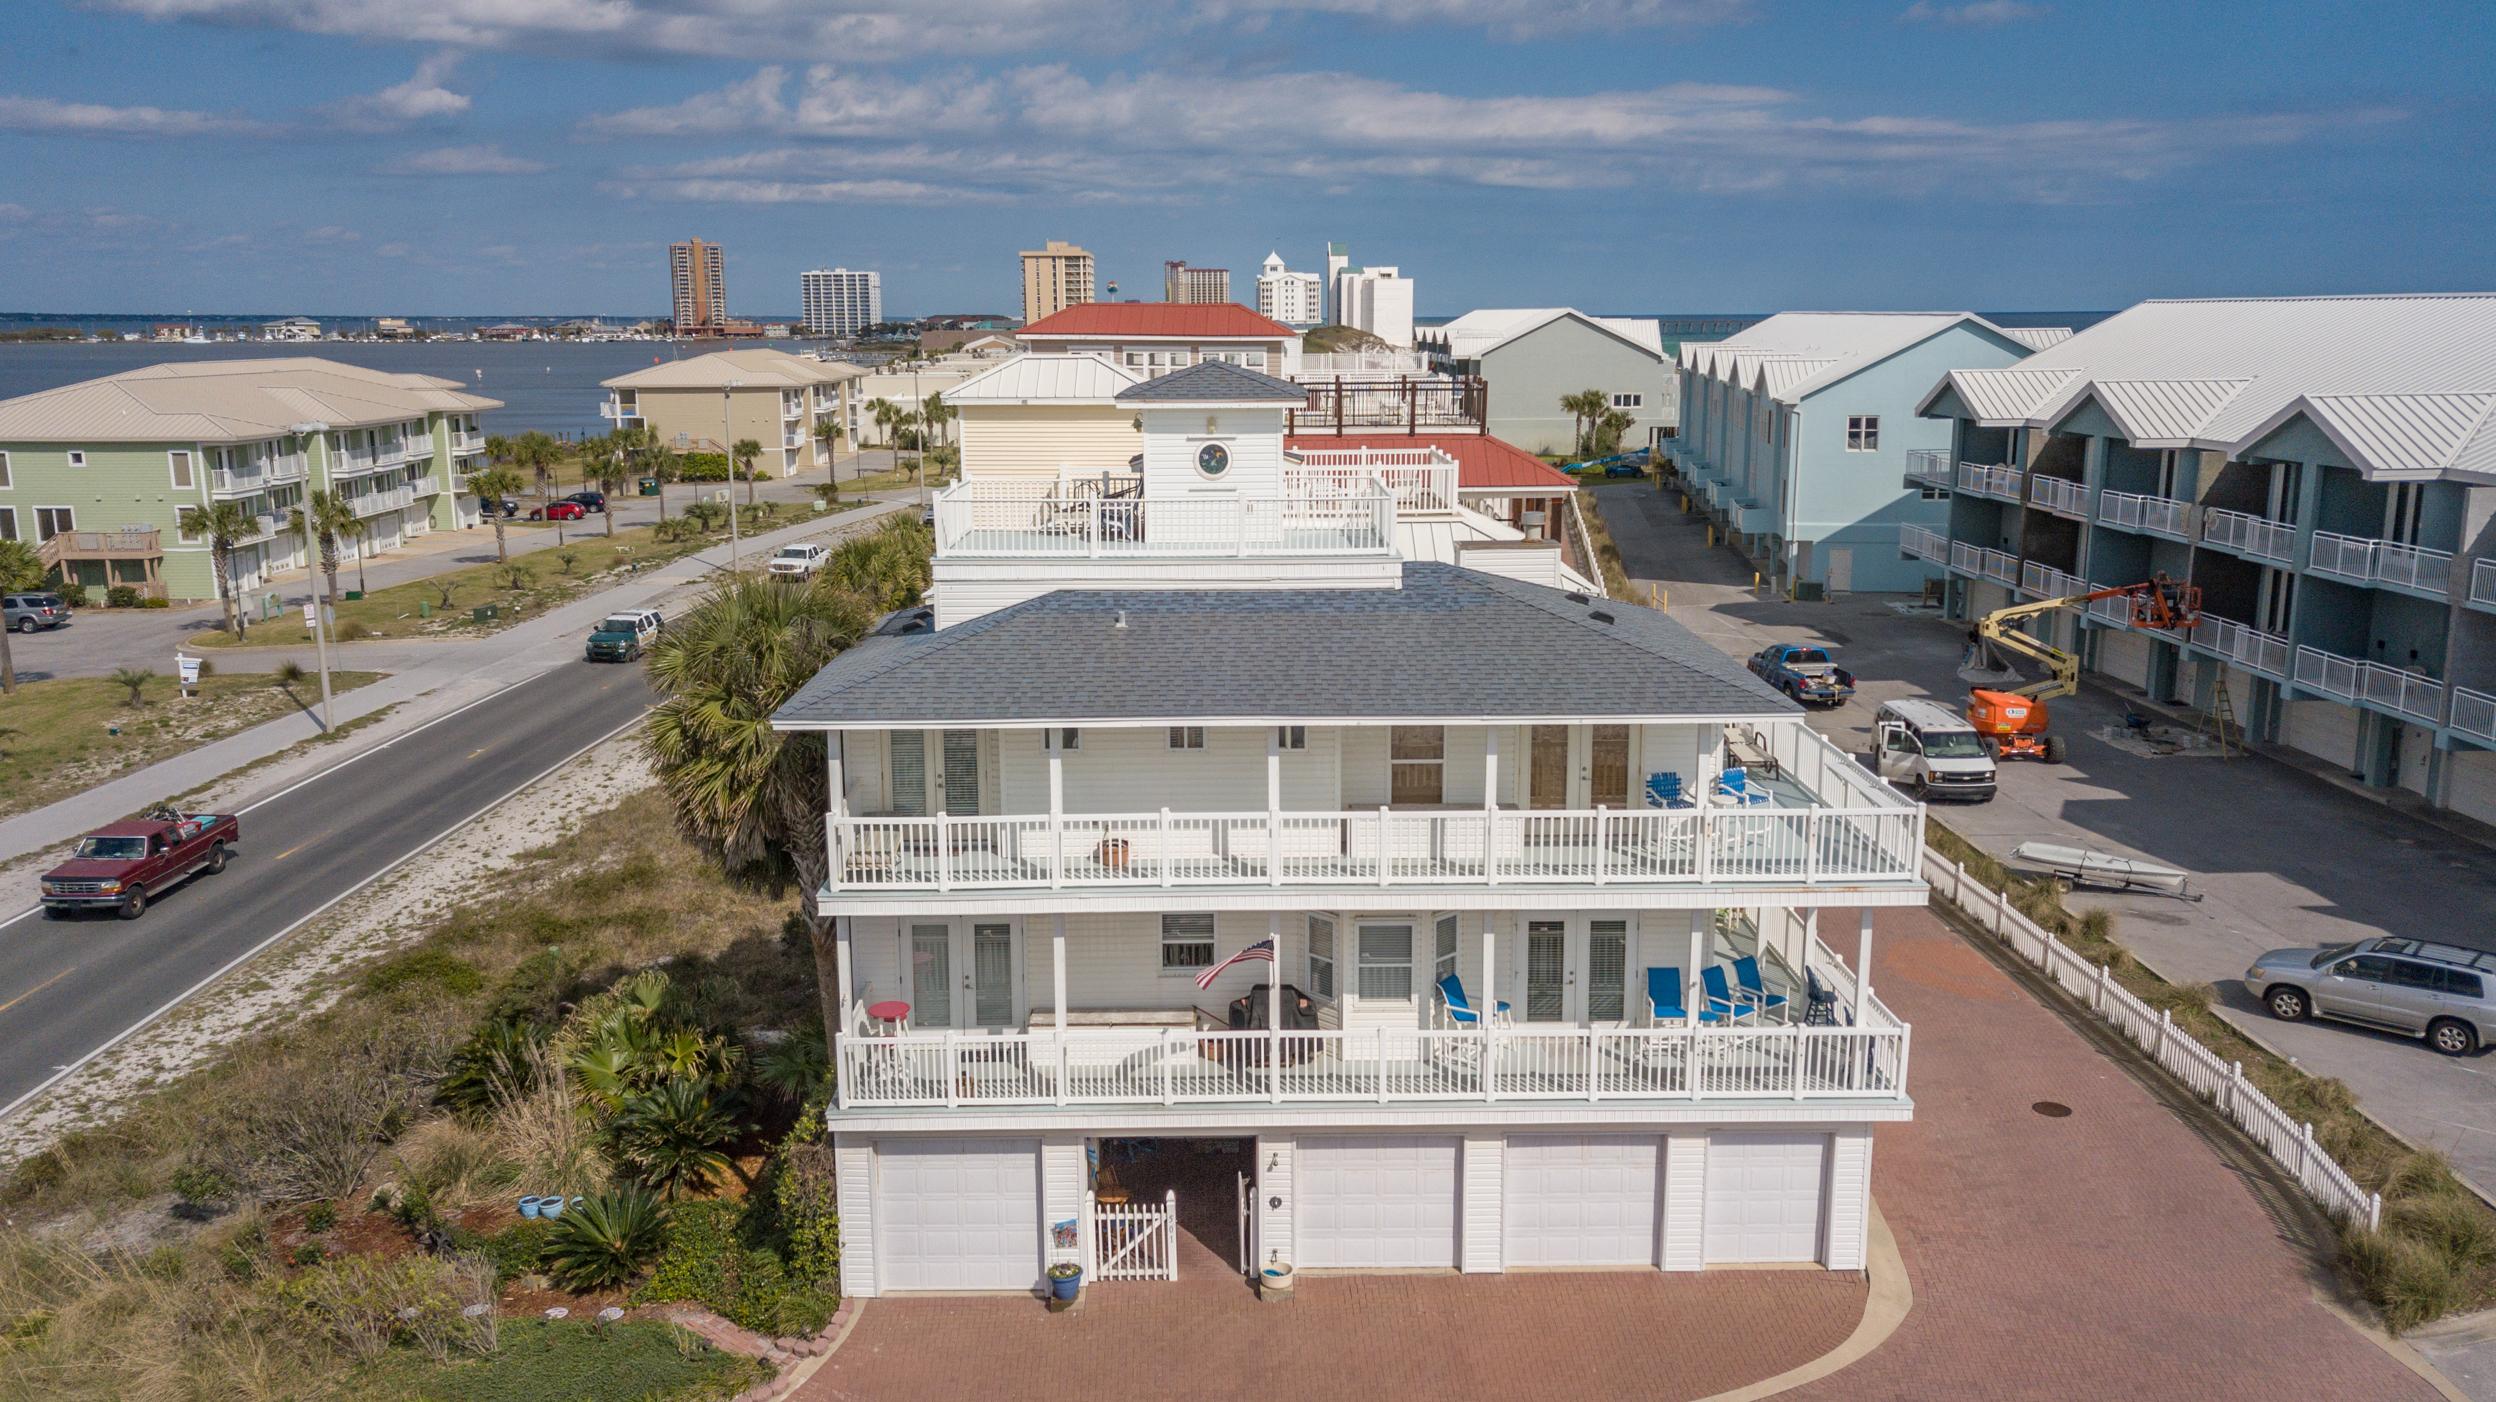 White Sands Cottage 501 Life's a Beach House Townhouse rental in White Sands Pensacola Beach in Pensacola Beach Florida - #61